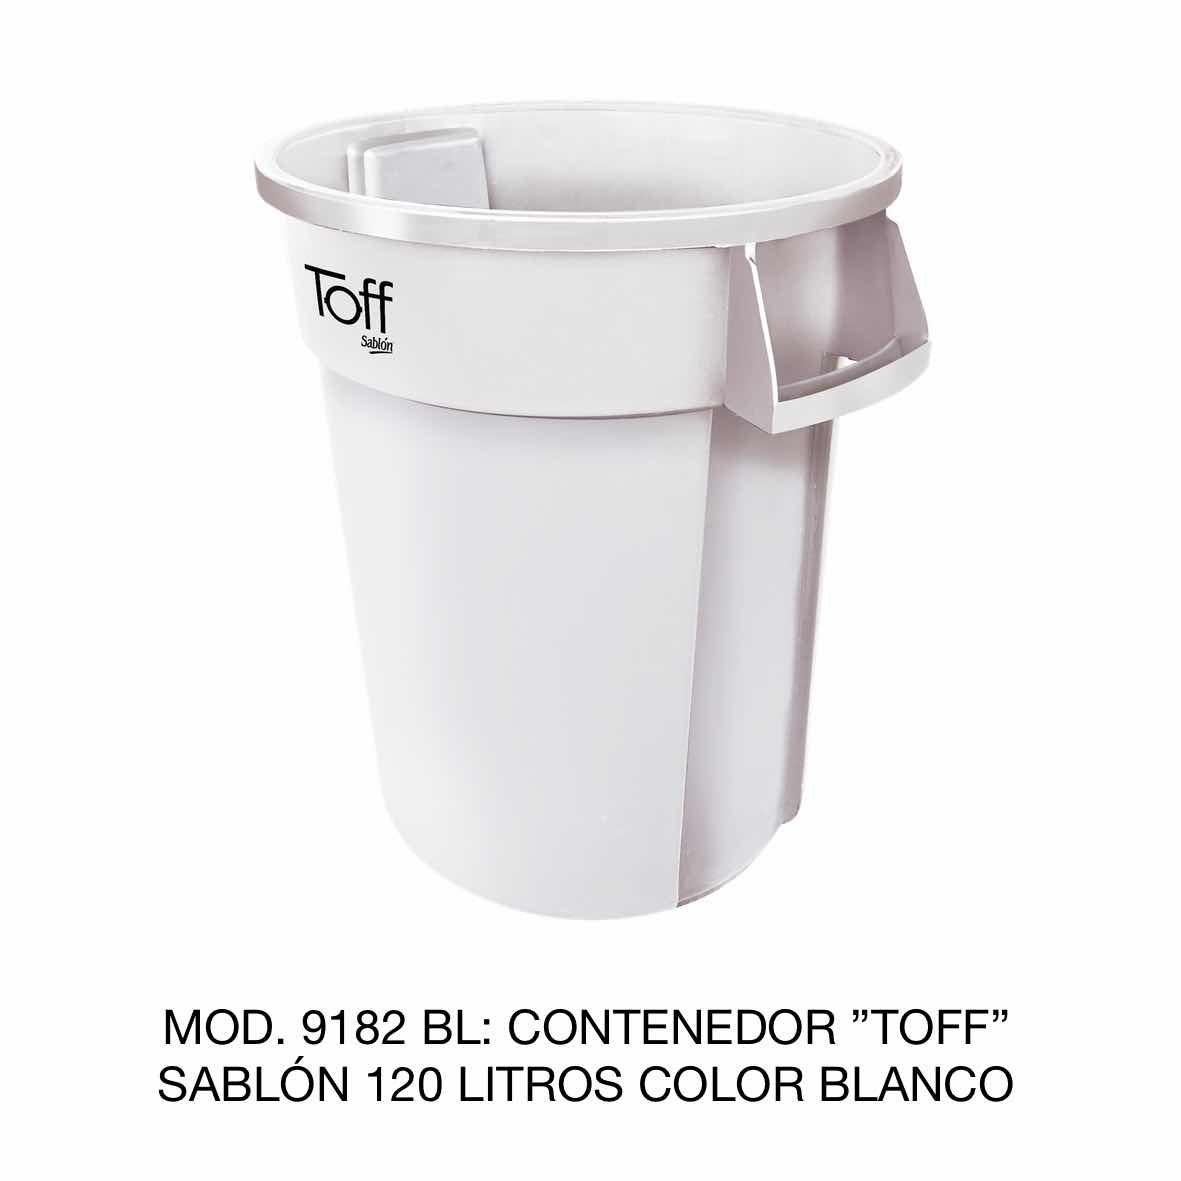 Contenedor de basura Sablón modelo TOFF de 120 litros Modelo 9182 BL Color Blanco